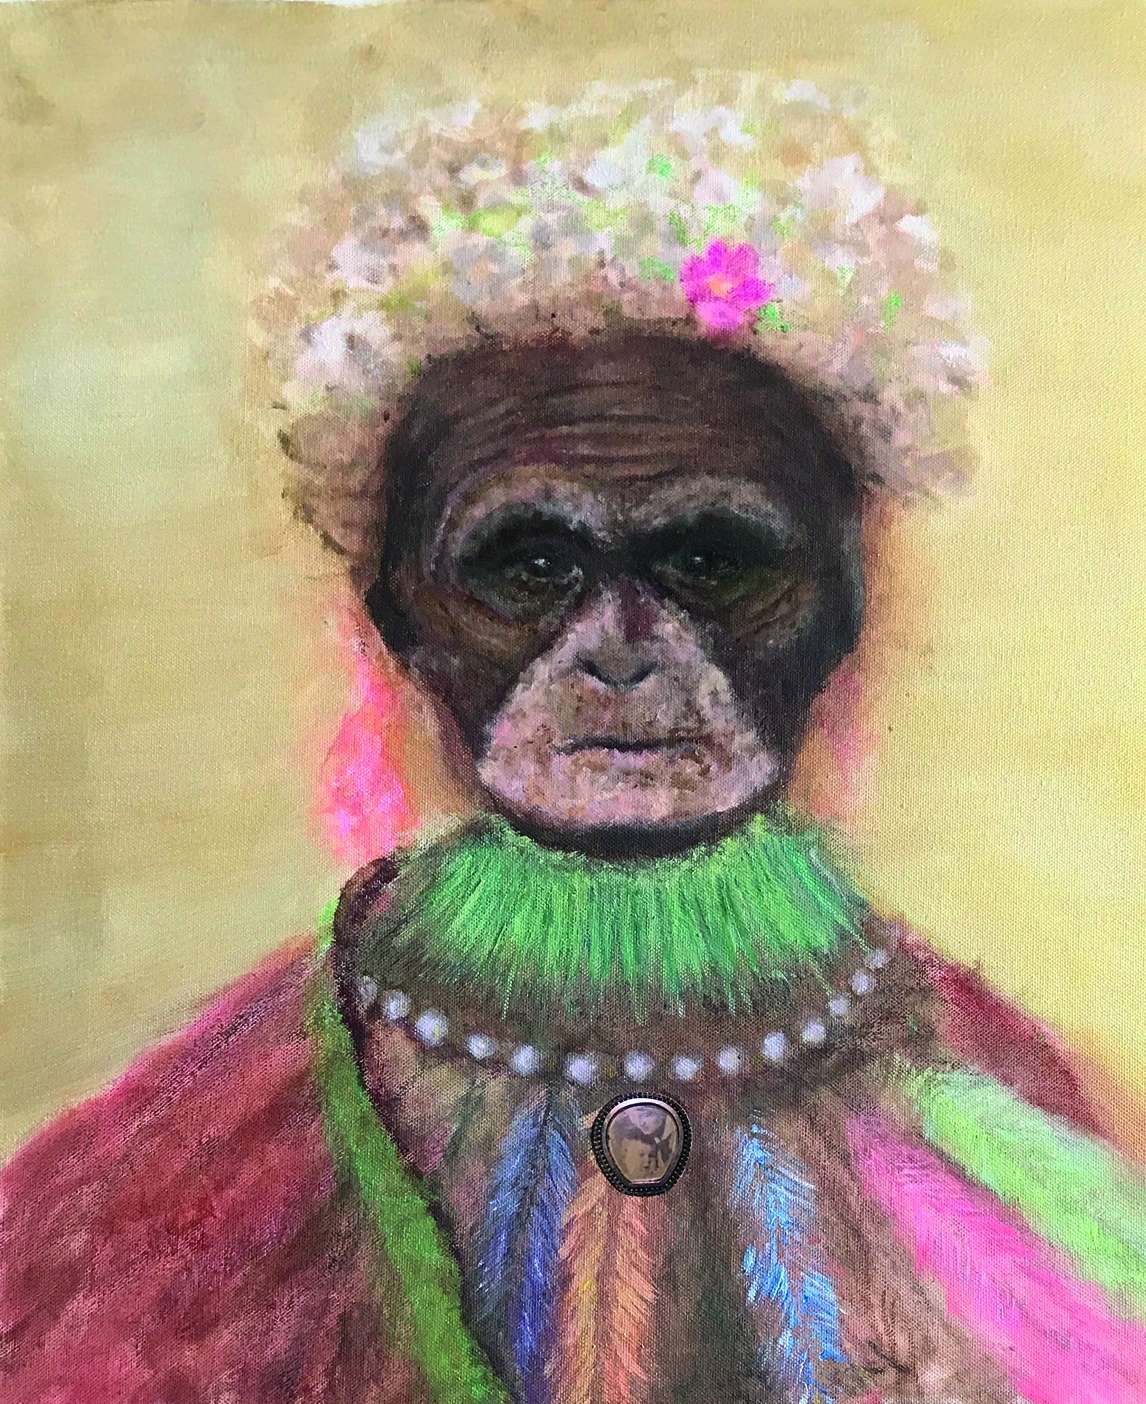 »MITOCHONDRISCHE EVA III«, Malerei, Konzeptkunst, Mixed Media auf Leinwand, 2019